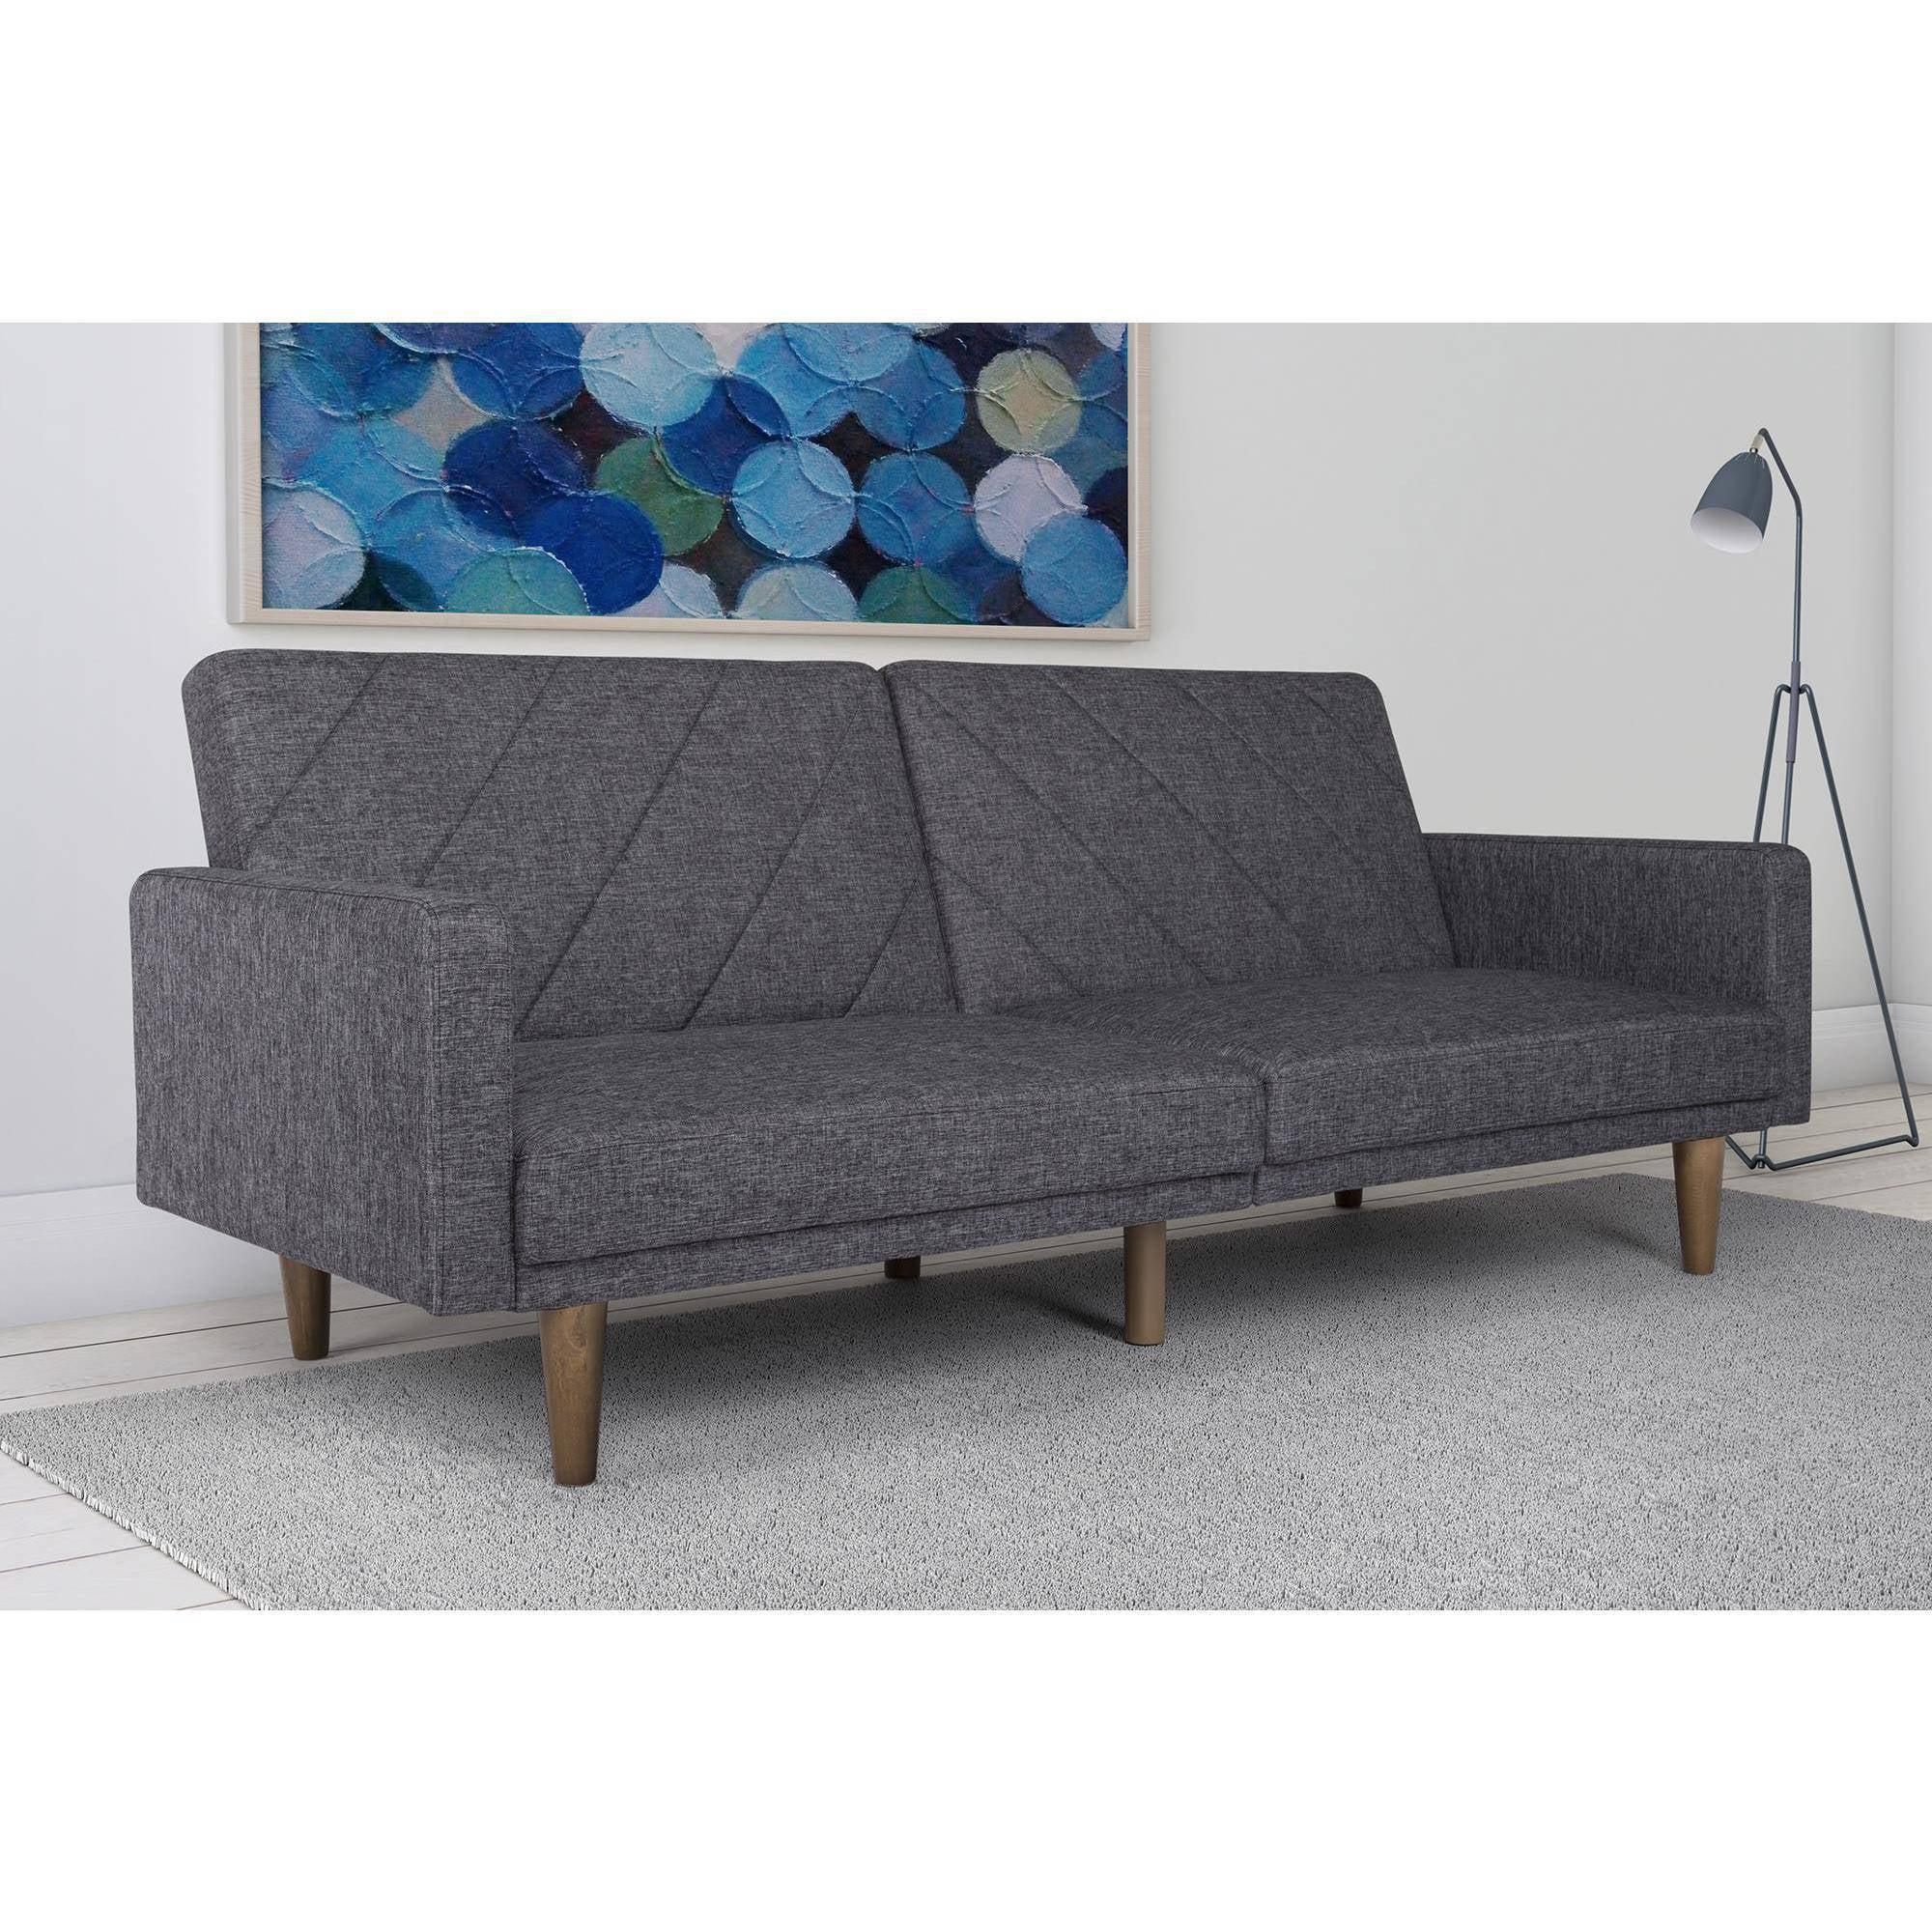 futon factory paris ackermans bedding the bedroom shop linen factory in warehouse mississauga. Black Bedroom Furniture Sets. Home Design Ideas